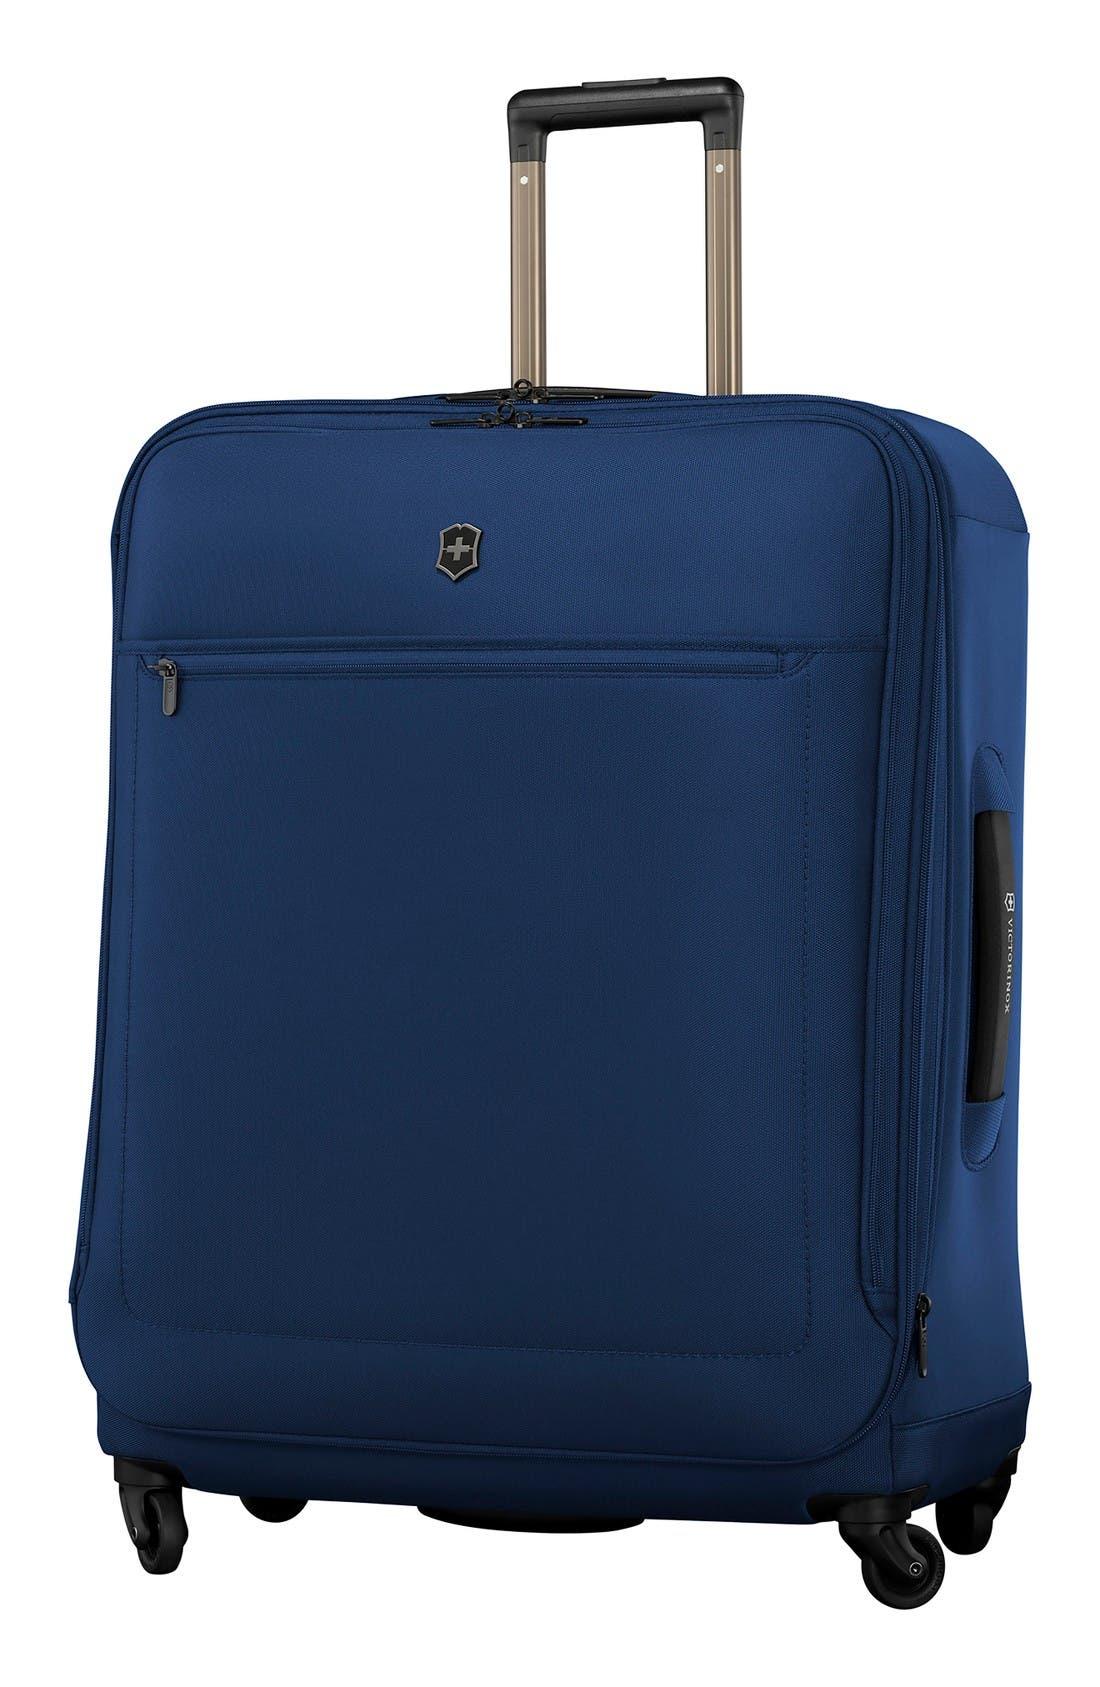 Victorinox Swiss Army® Avolve 3.0 28-Inch Wheeled Packing Case